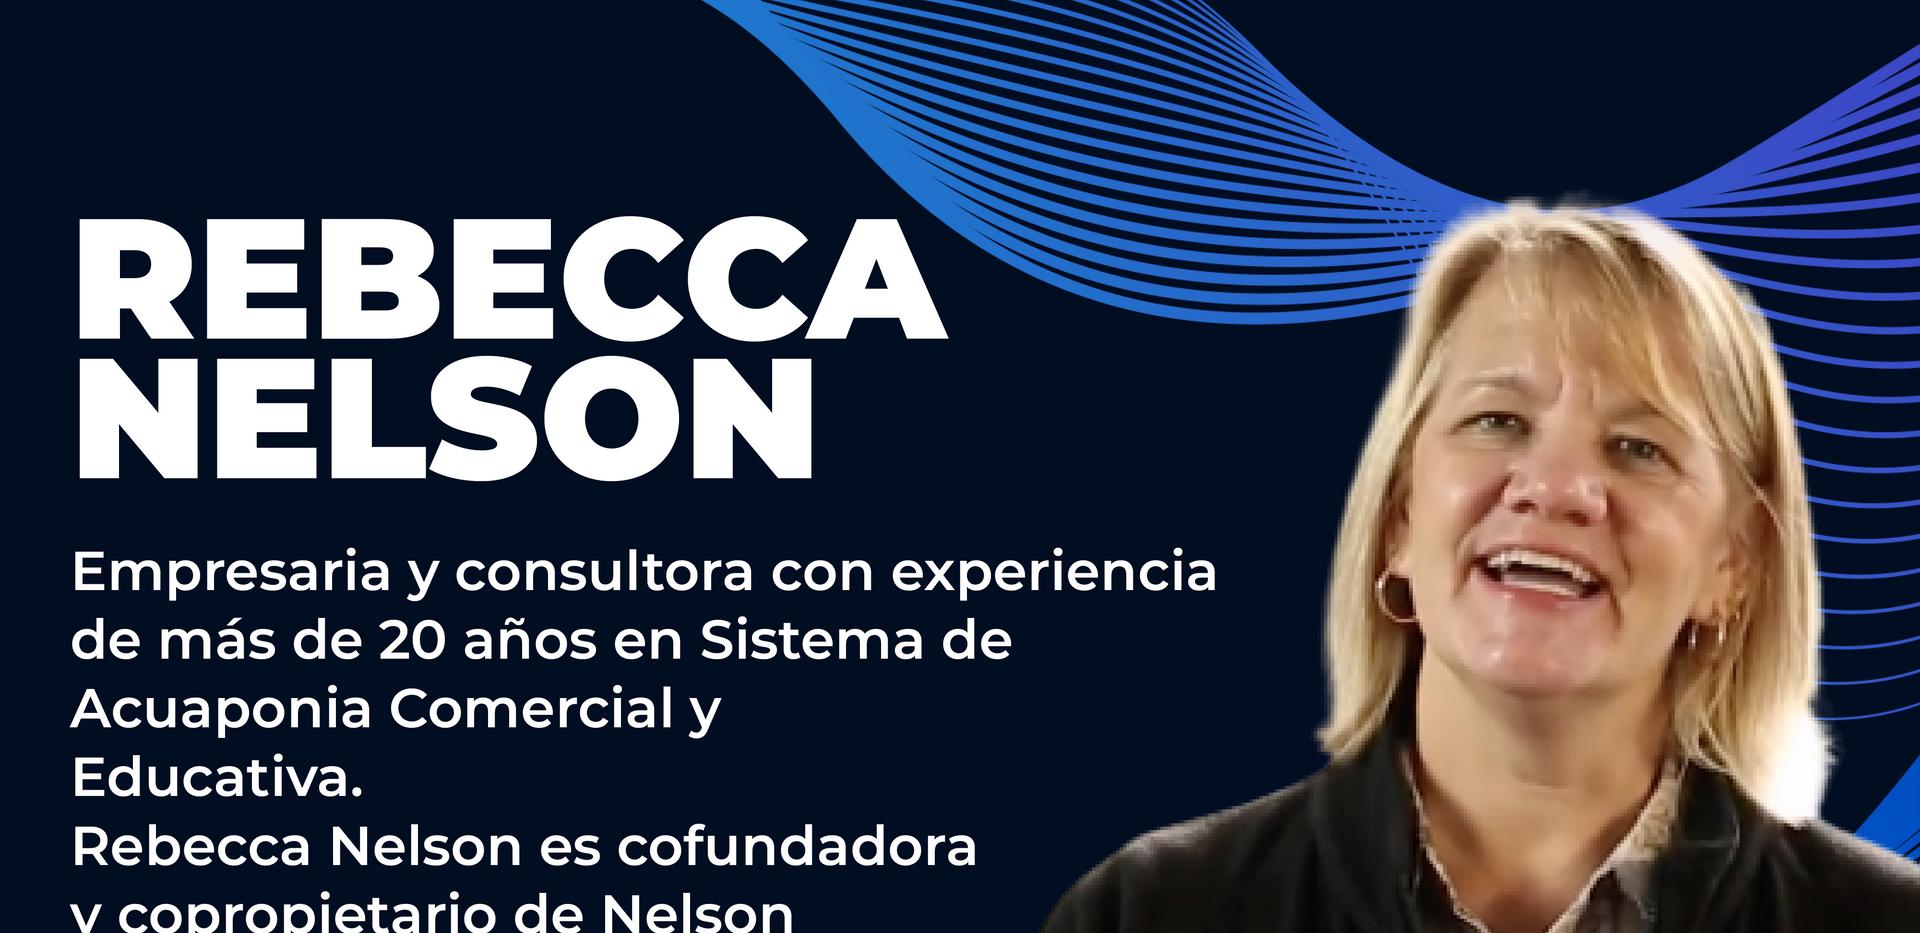 REBECCA NELSON ESP.png